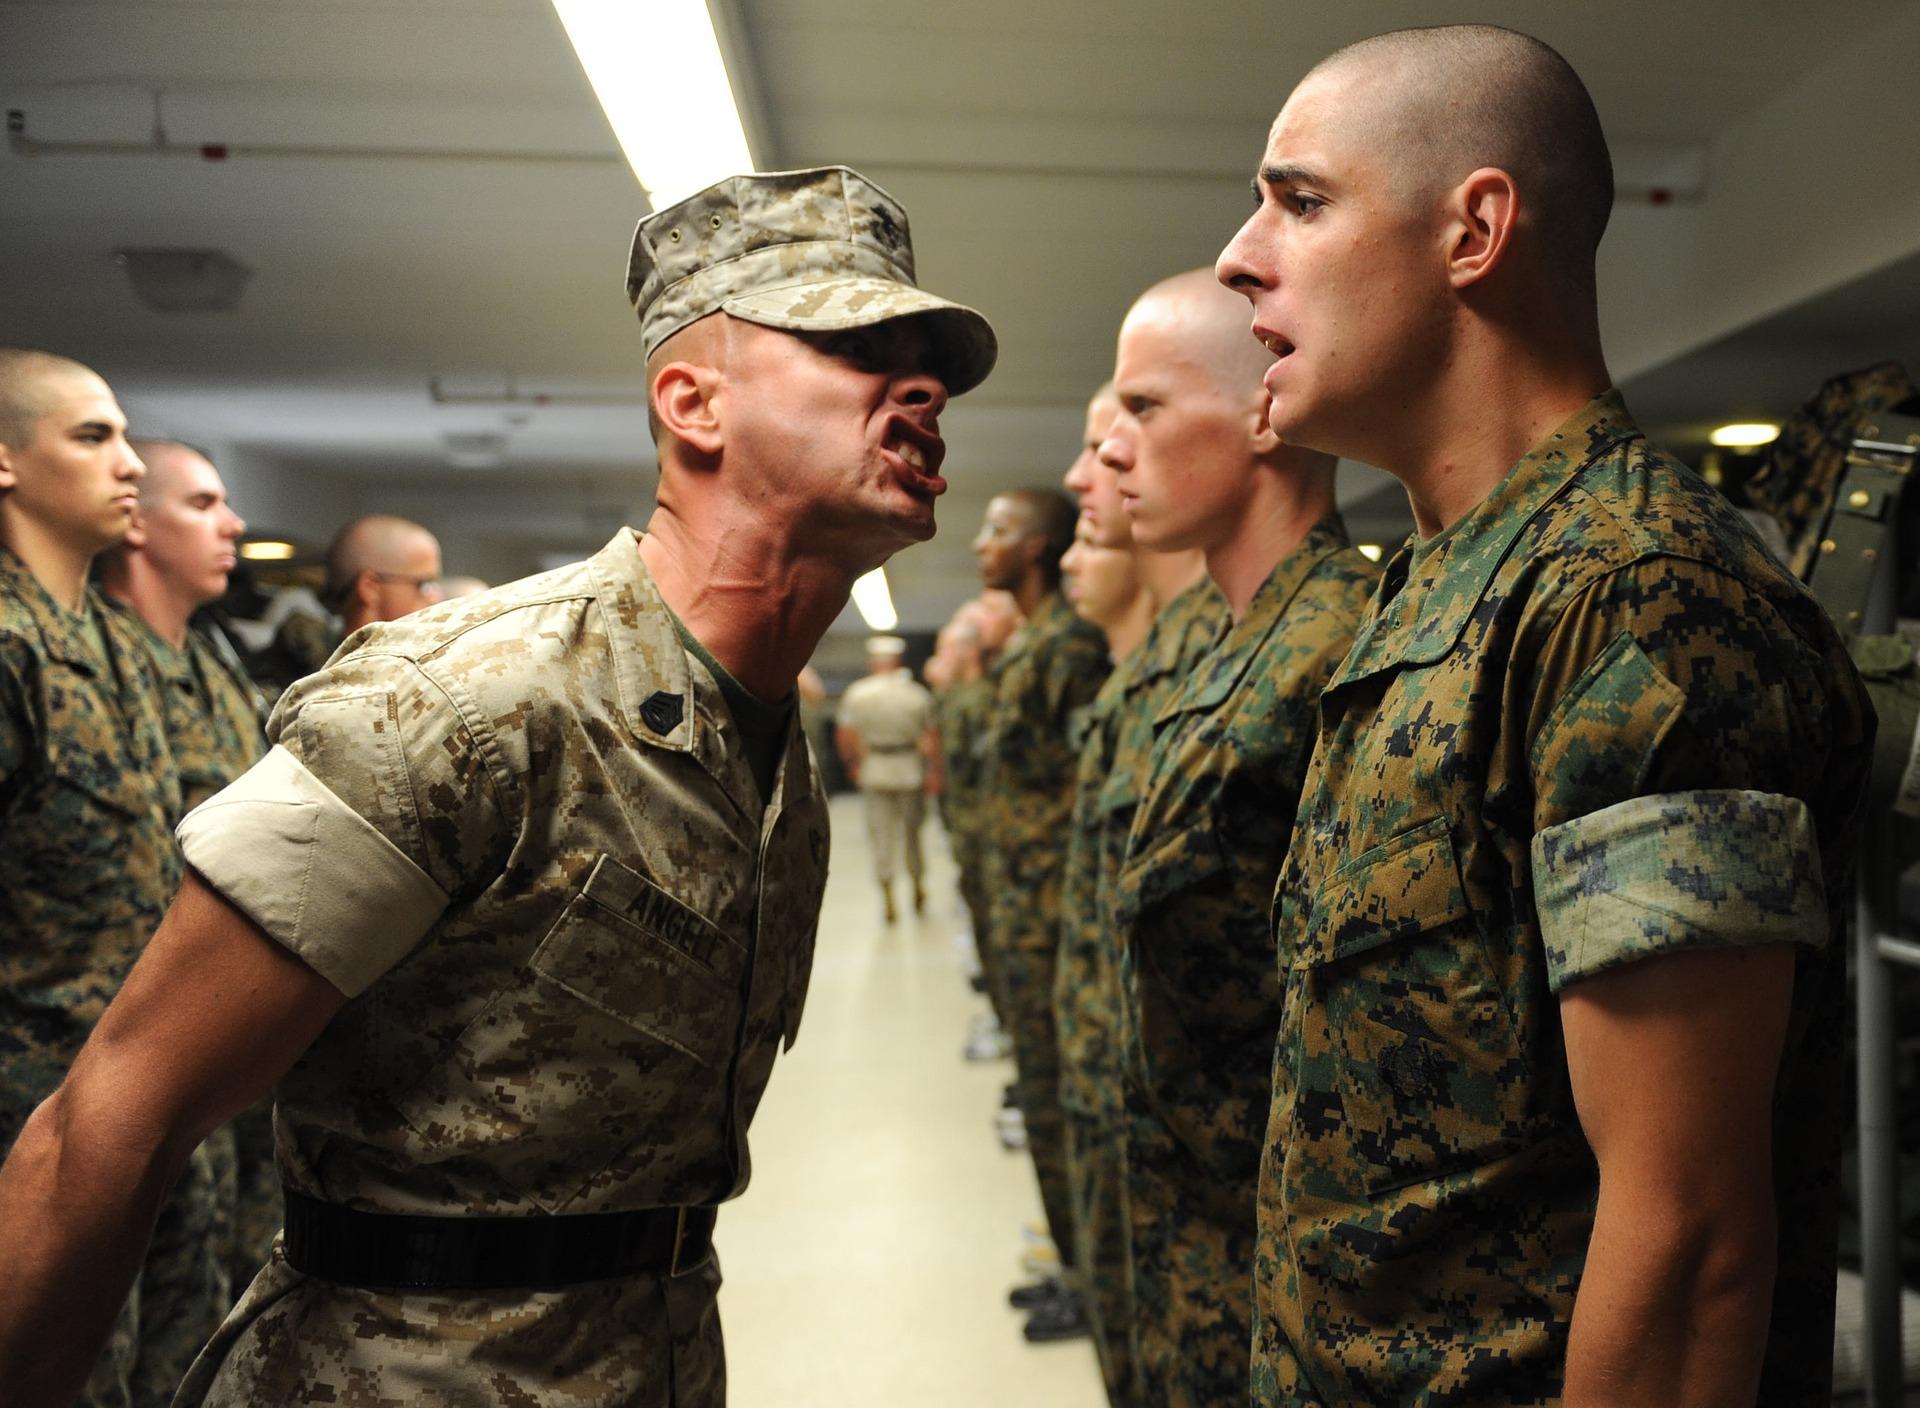 Strong Men Teaching Weak Men To Be Stronger